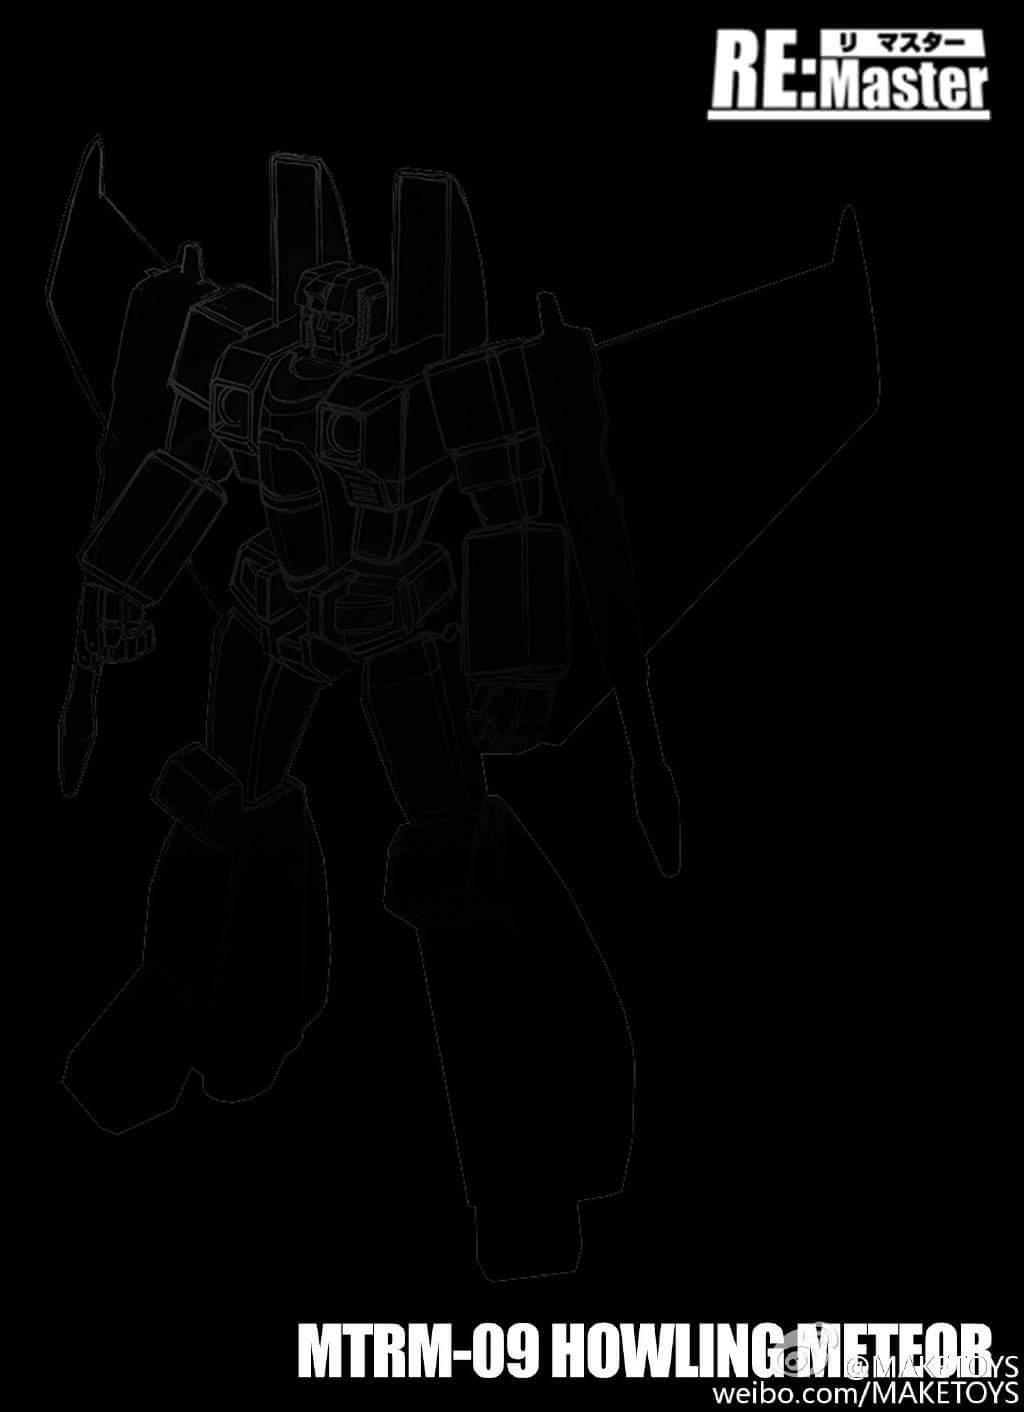 [Maketoys] Produit Tiers - MTRM-11 Meteor (aka Starscream/Égo), MTRM-12 Skycrow (aka Skywarp/Fraudeur) & MTRM-13 Lightning (aka Thundercracker/Coup de Tonnerre) LIyOlp3V